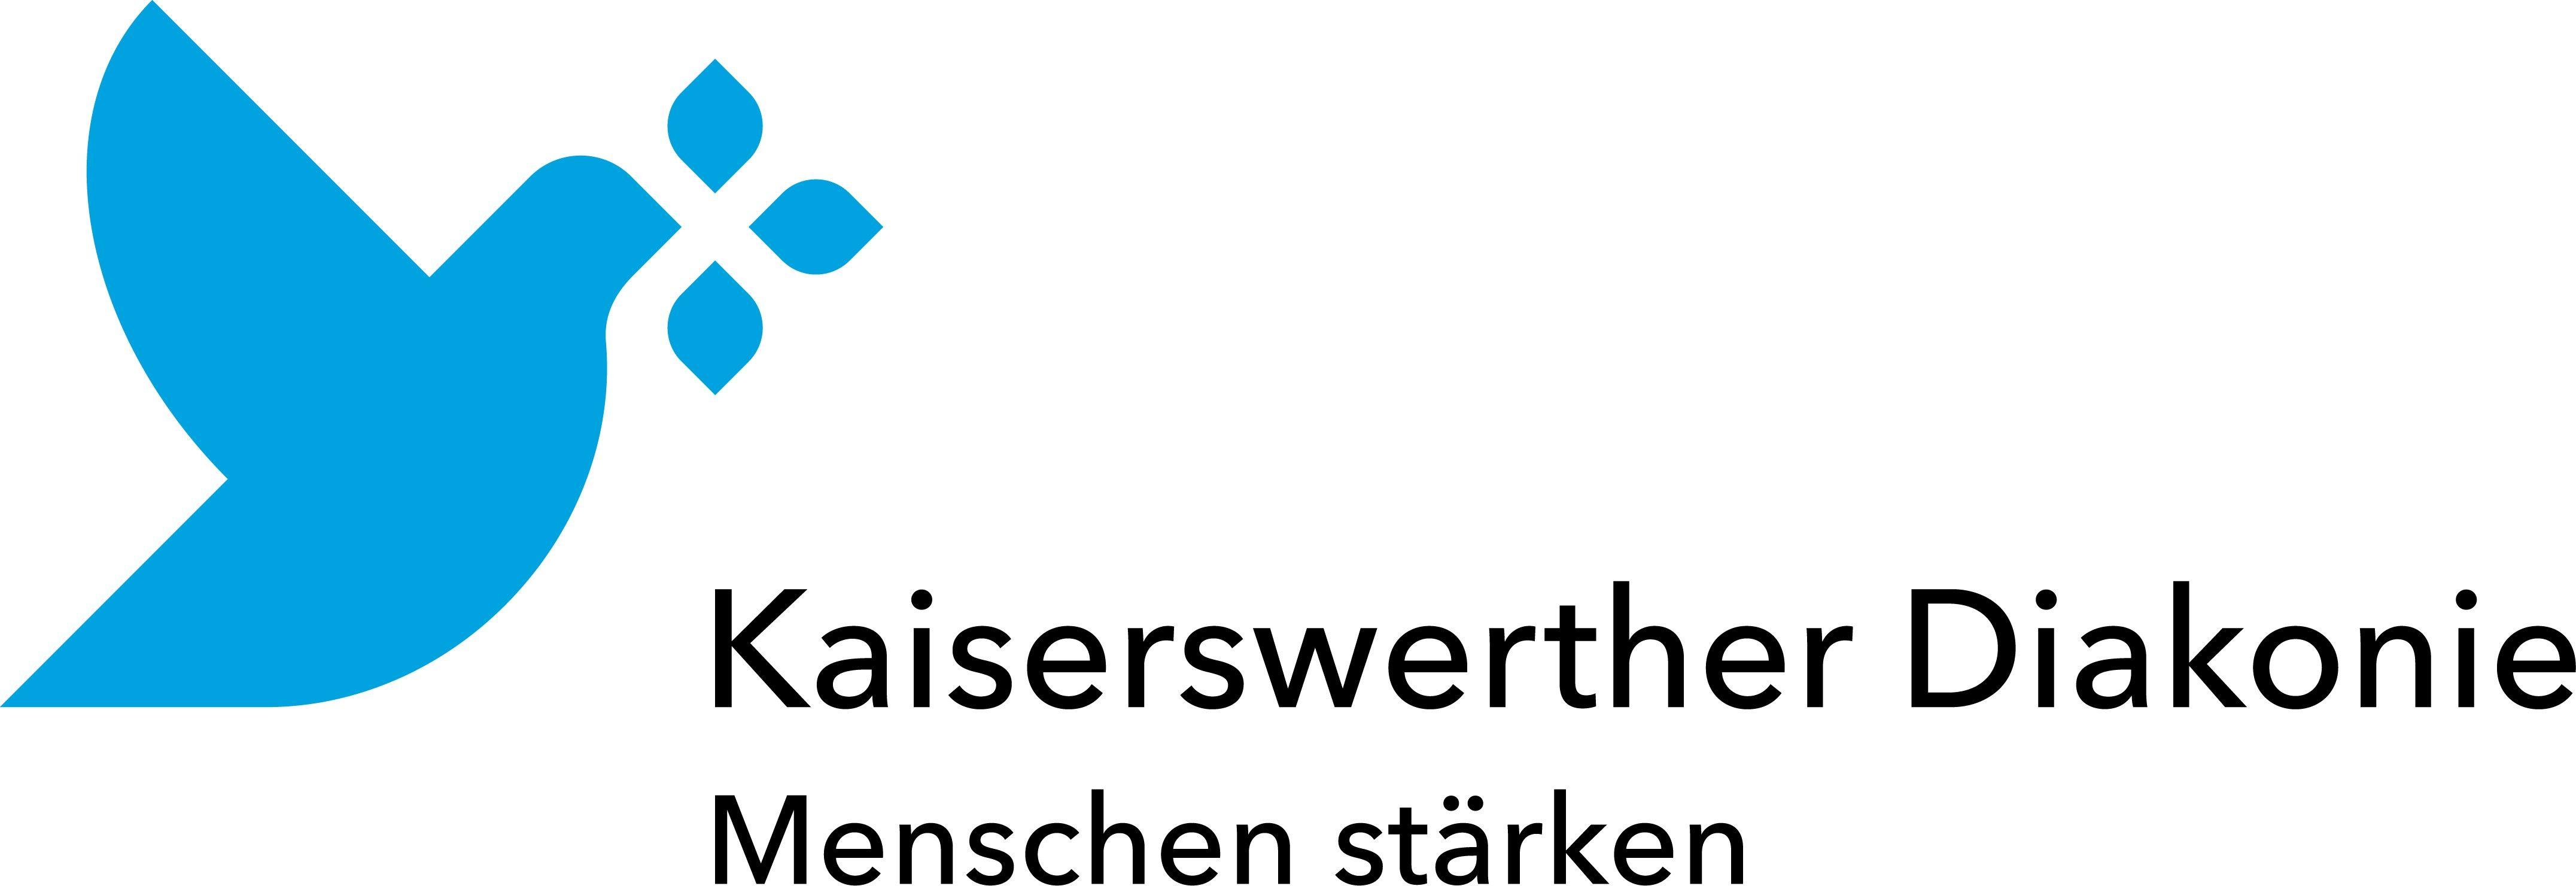 Logo: Kaiserswerther Diakonie  - Jugendhilfe